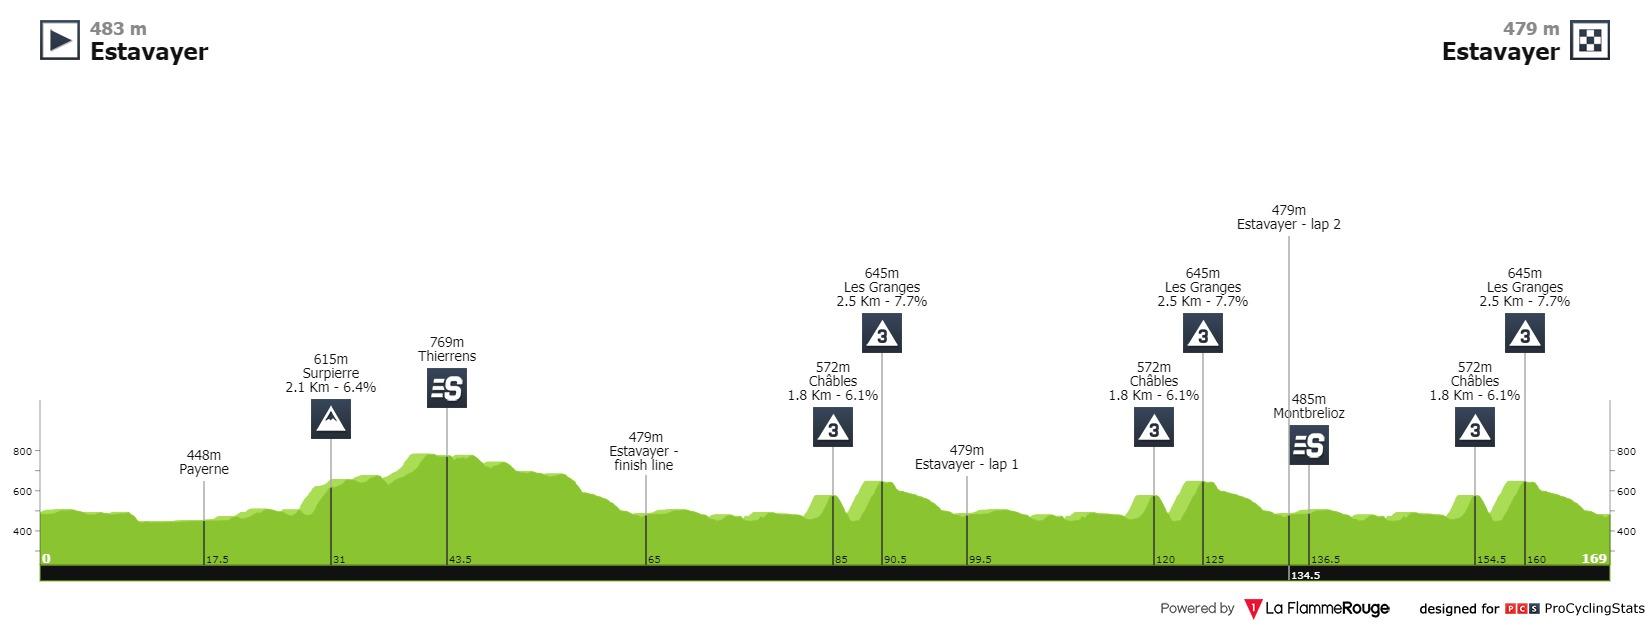 Soler marc Tour de Romandie